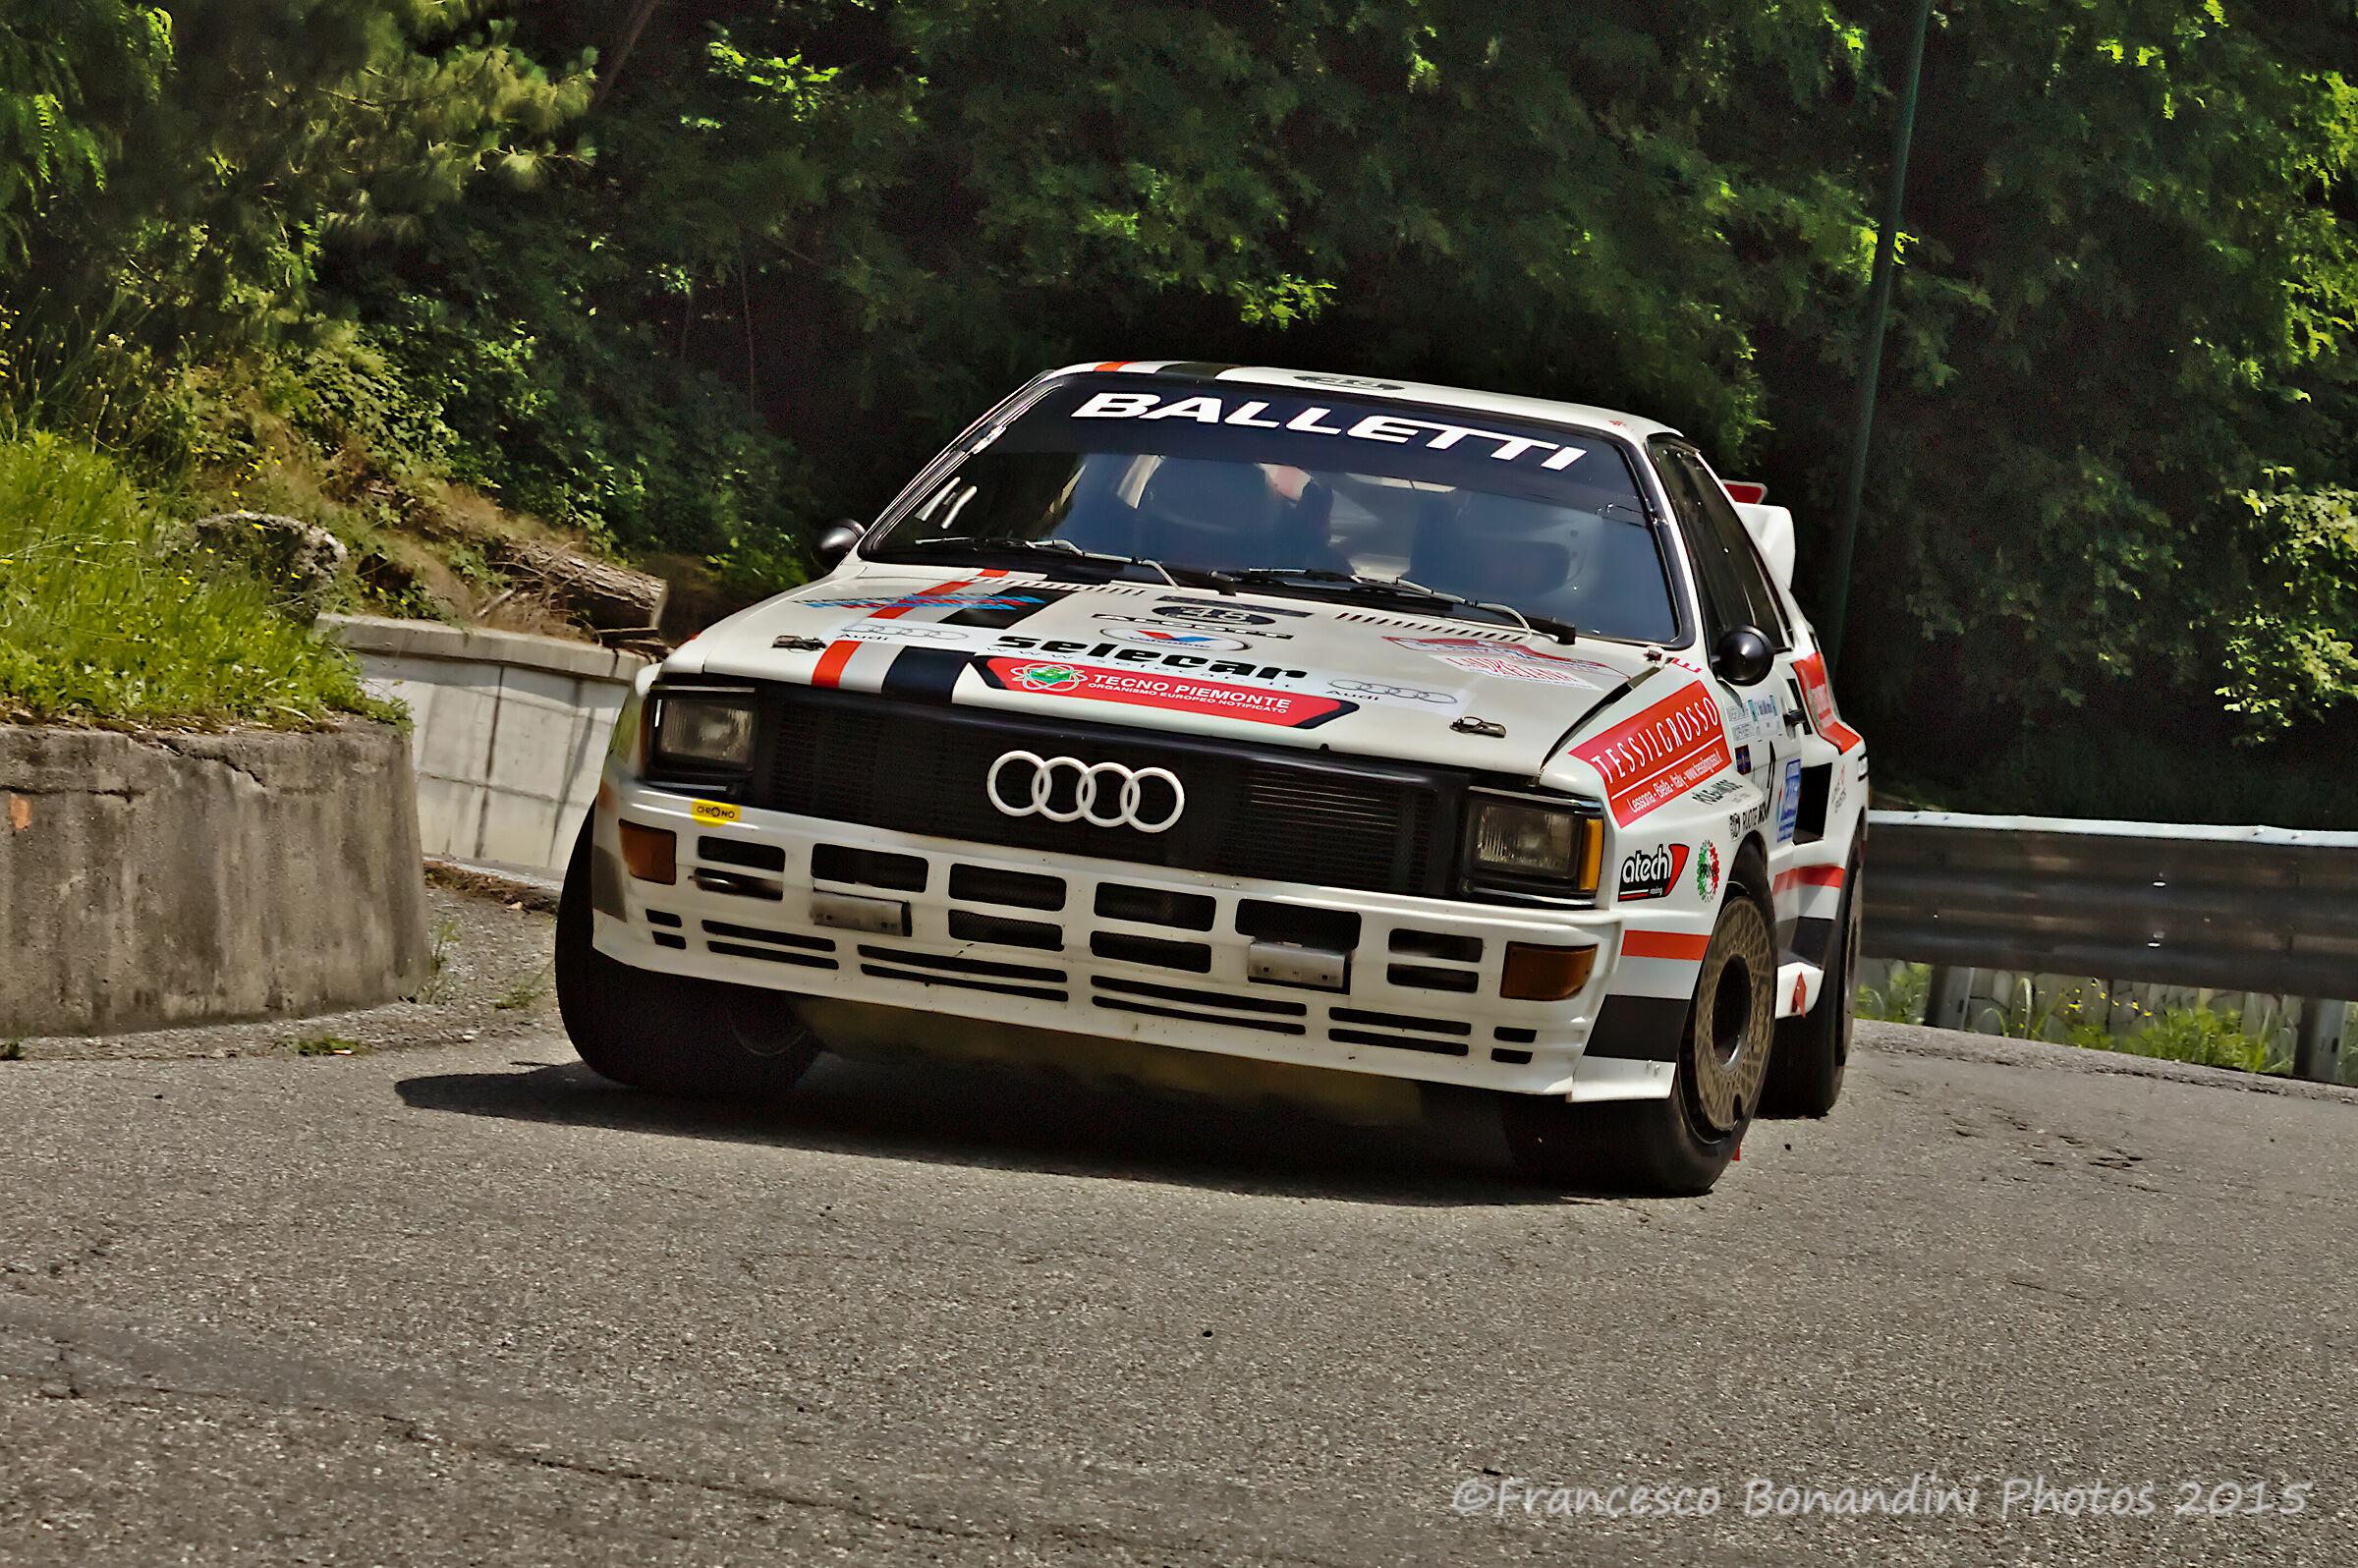 Audi epic...